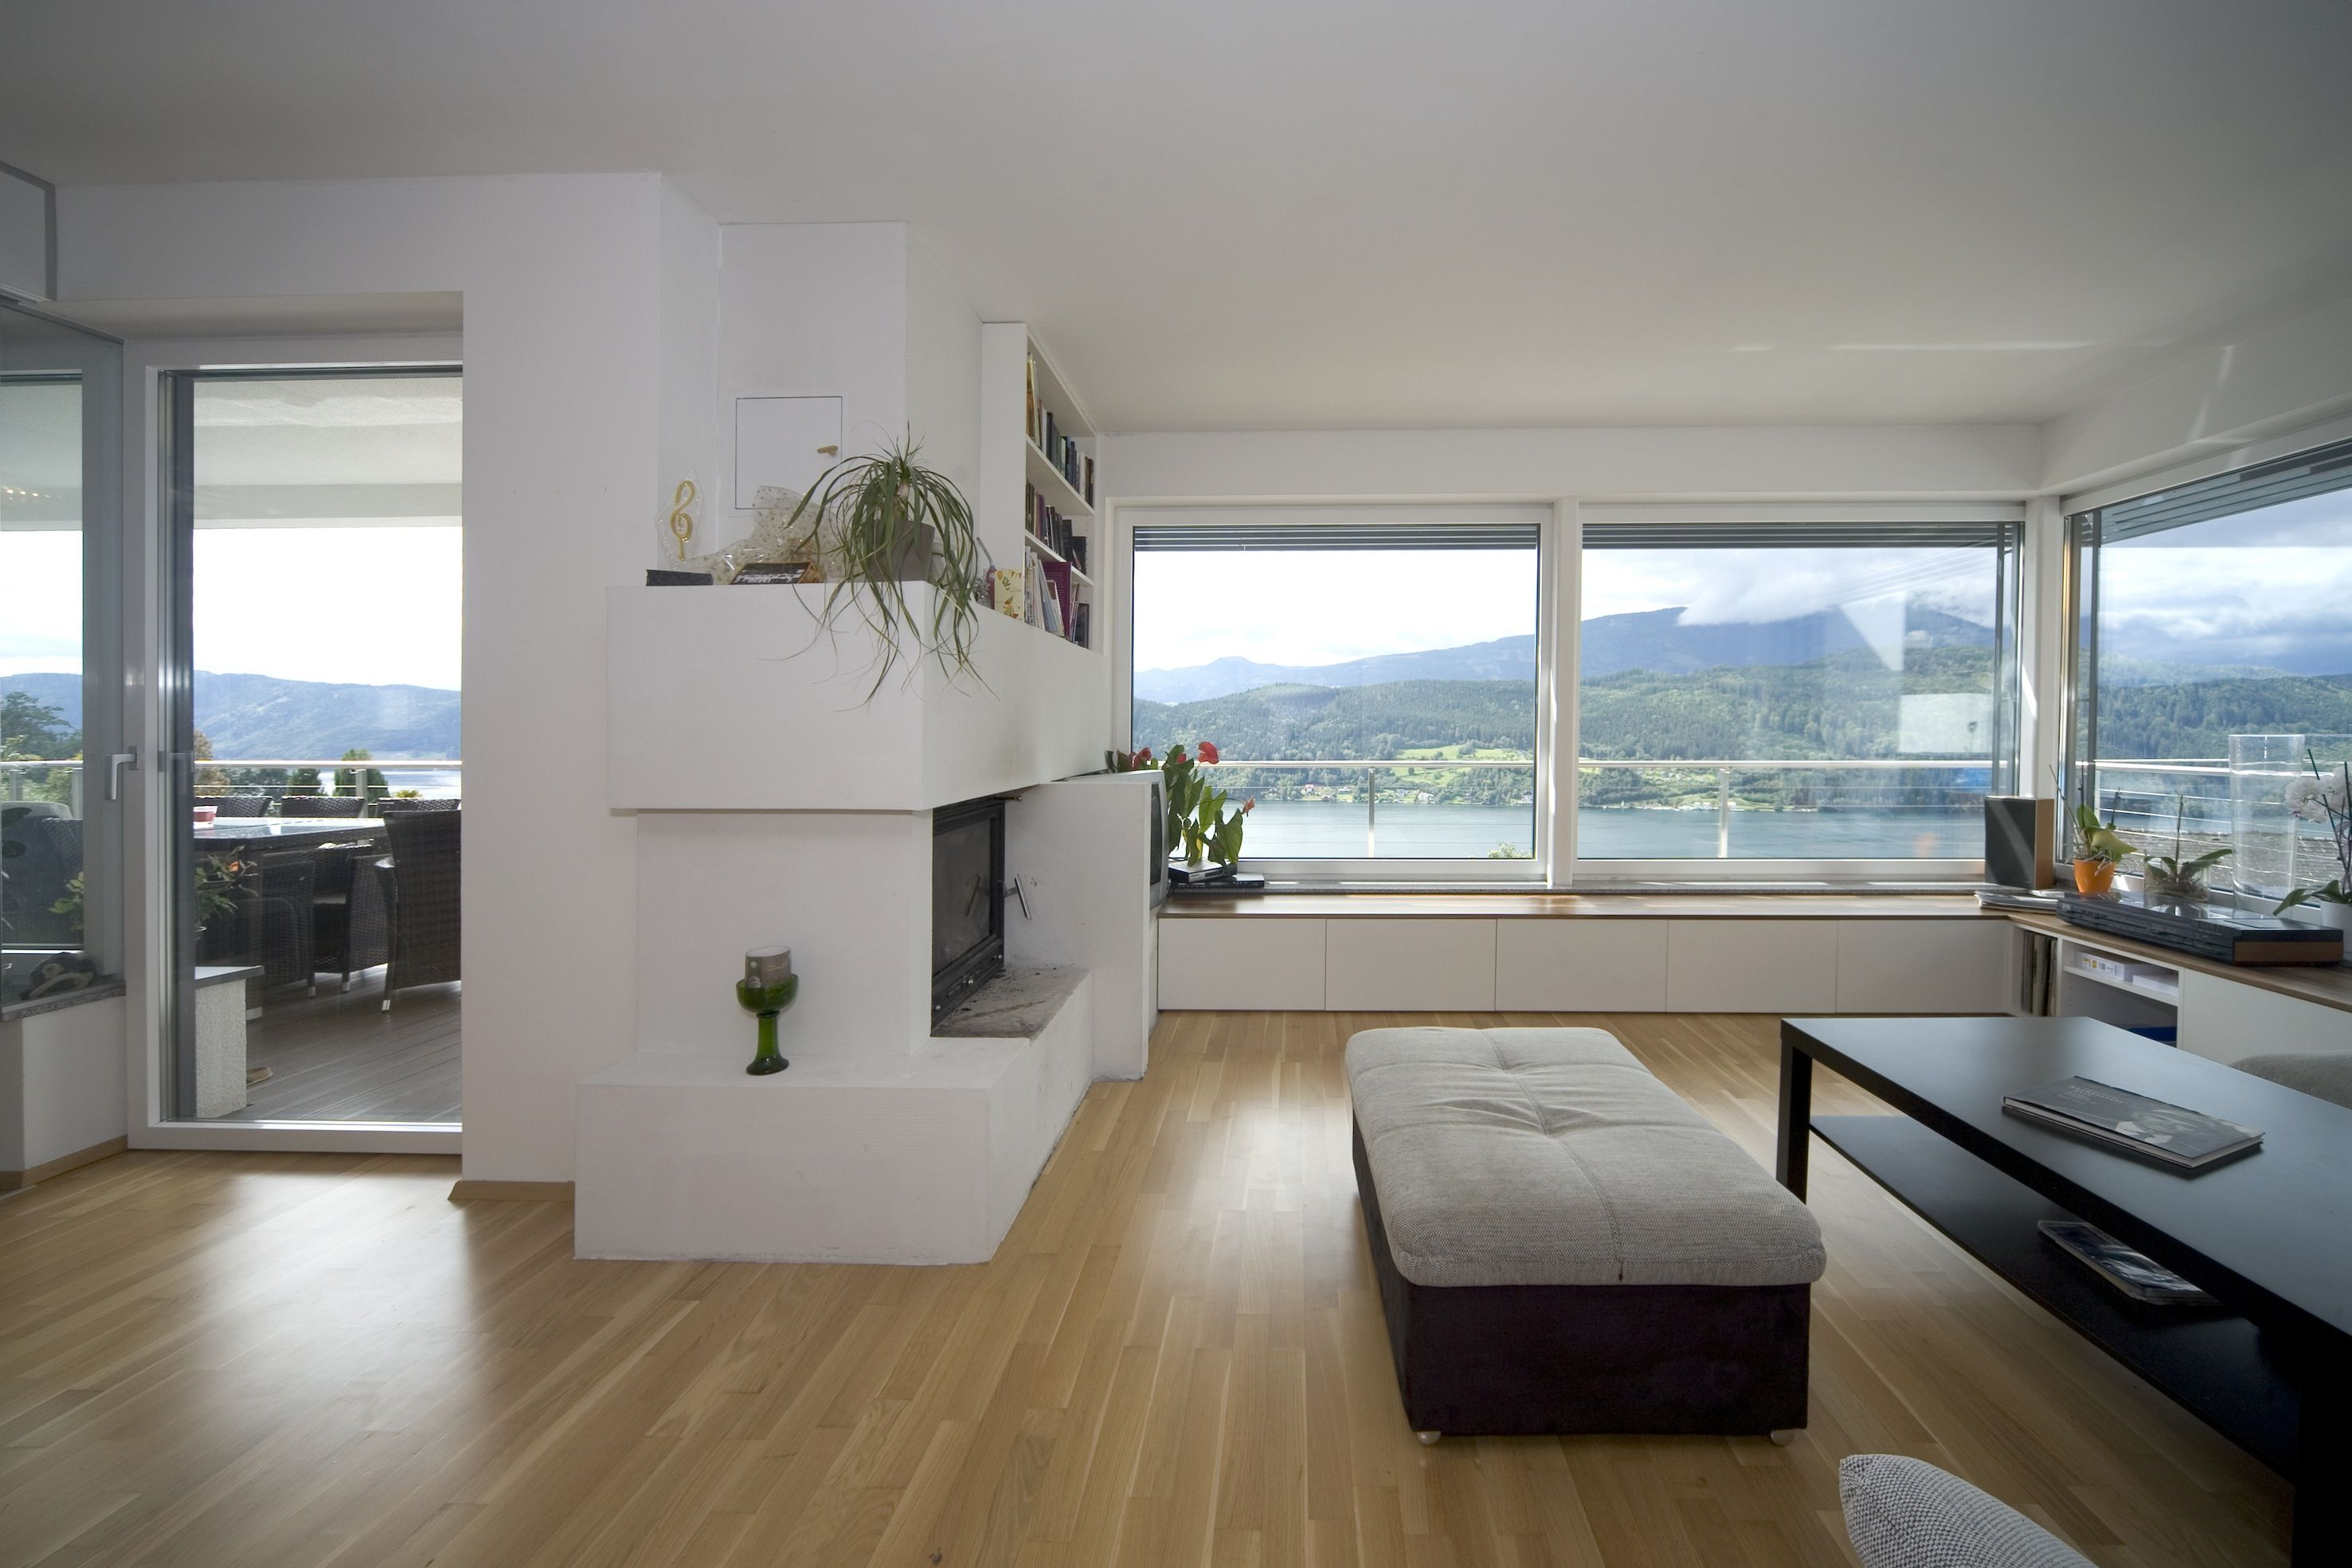 Internorm's windows make your living room spacious. Plastic/Aluminium KF 405 windows. #fenster #interior